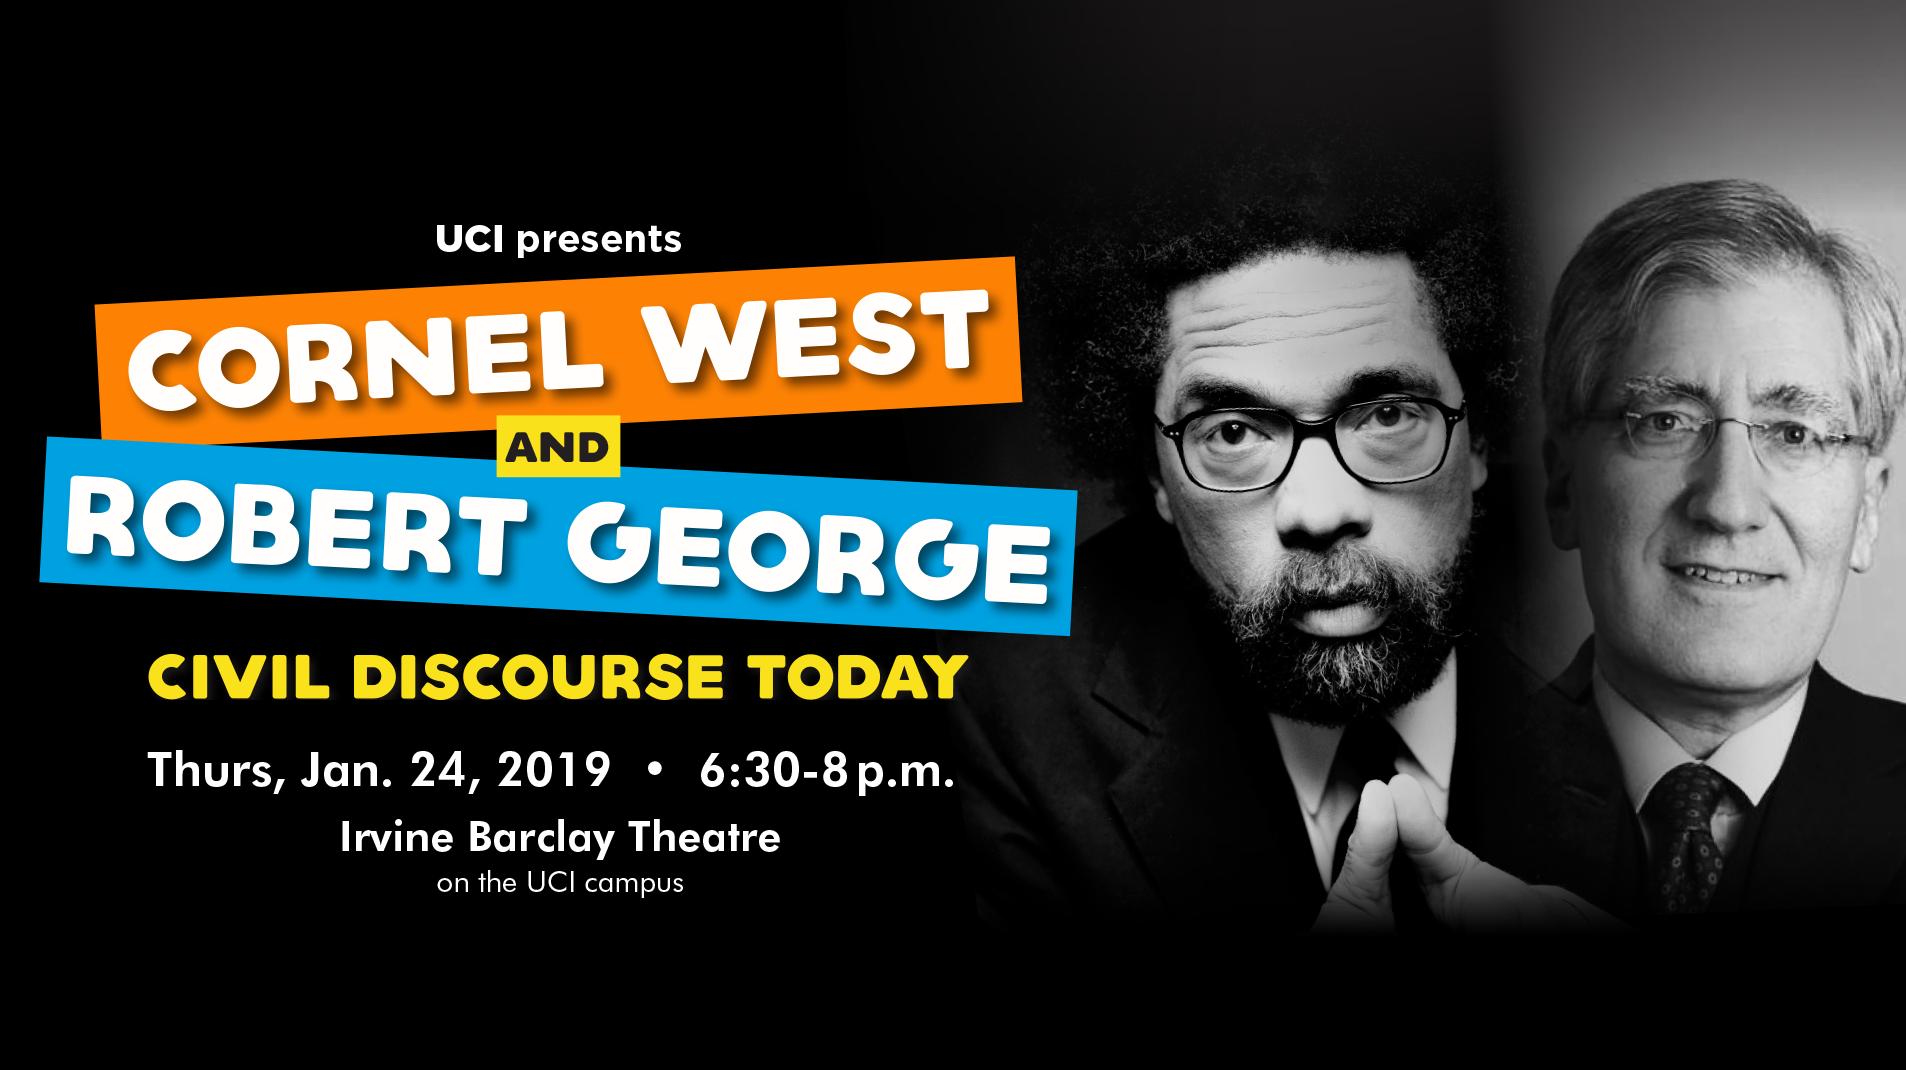 Cornel West & Robert George: Civil Discourse Today on Livestream